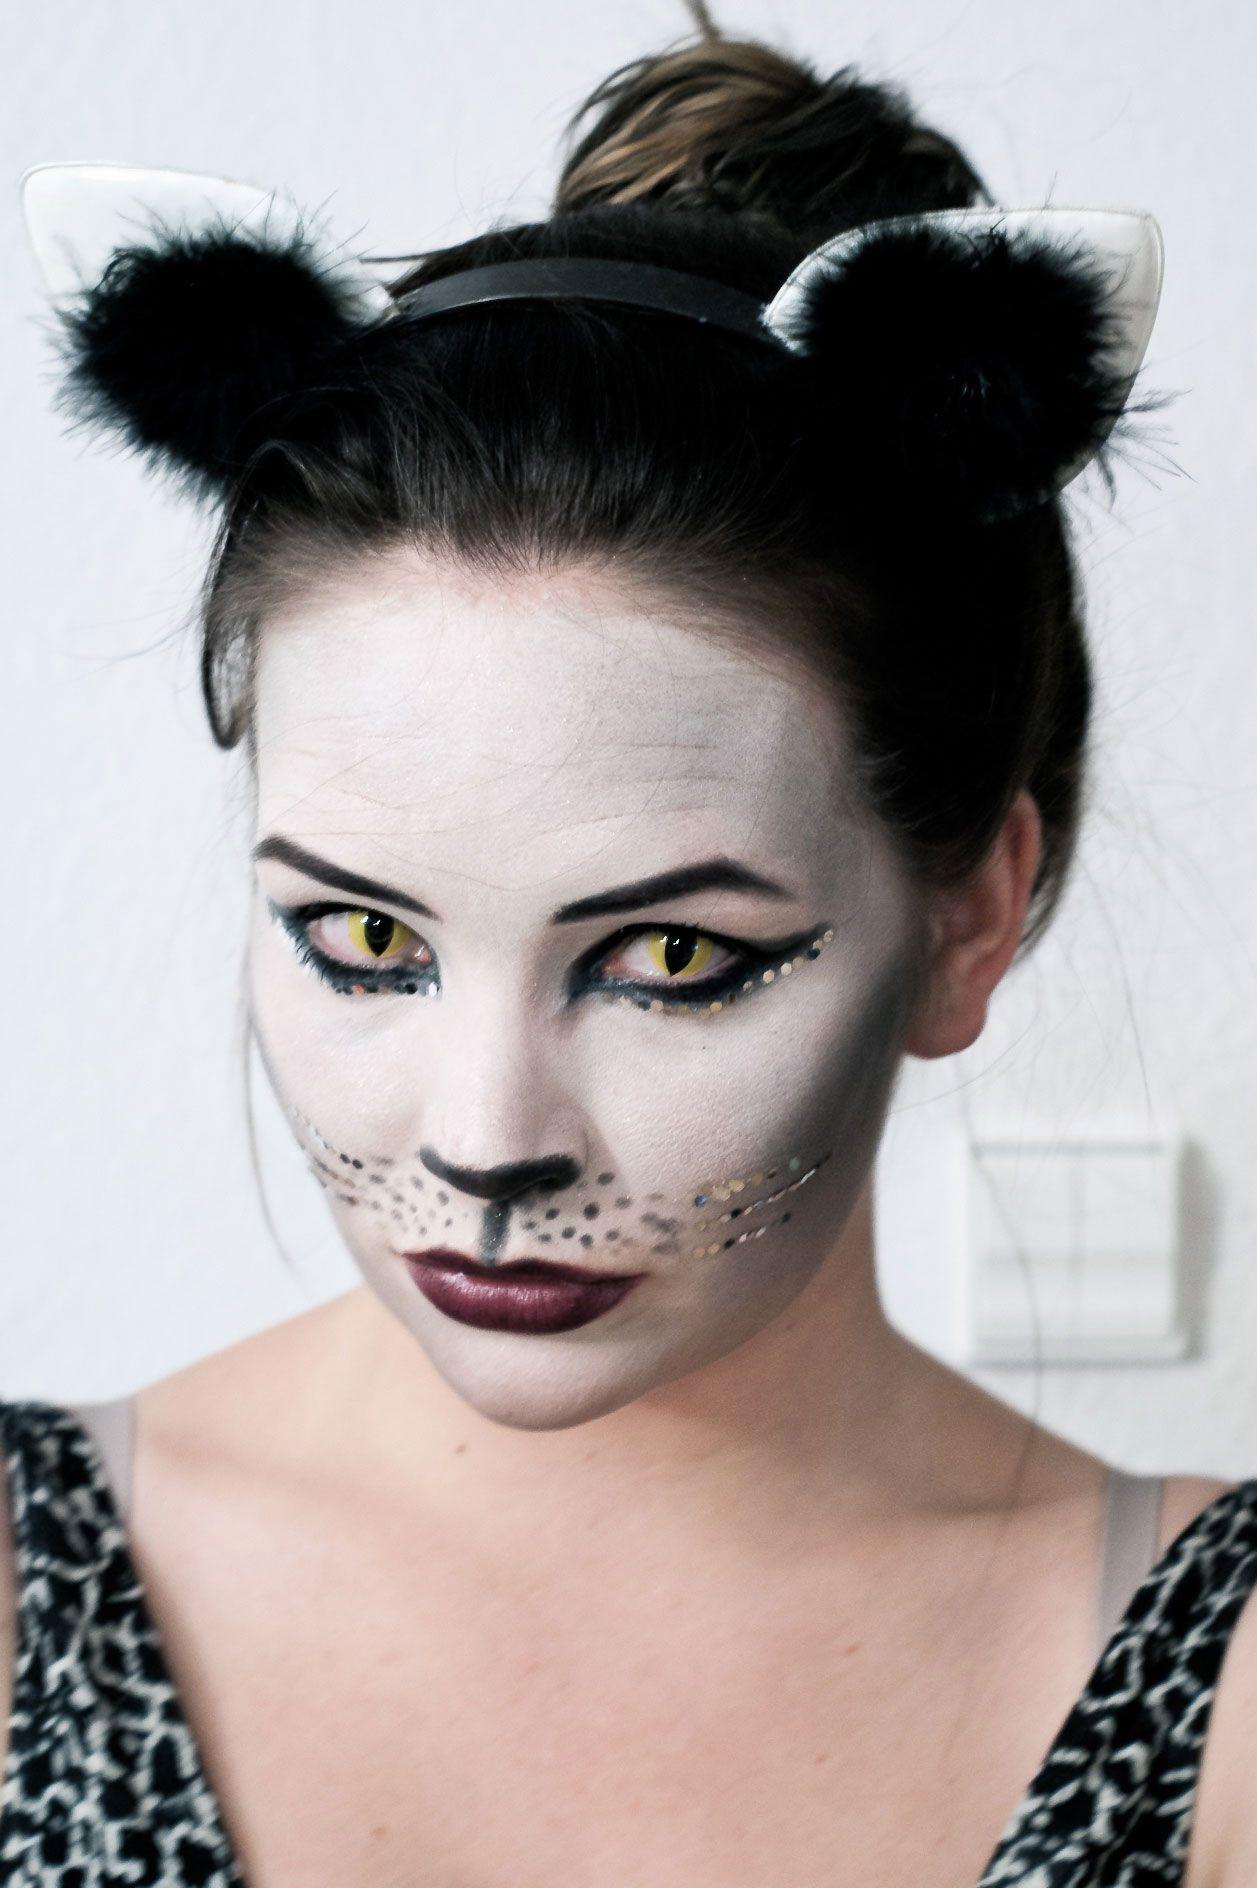 Prebases de maquillaje para Halloween.